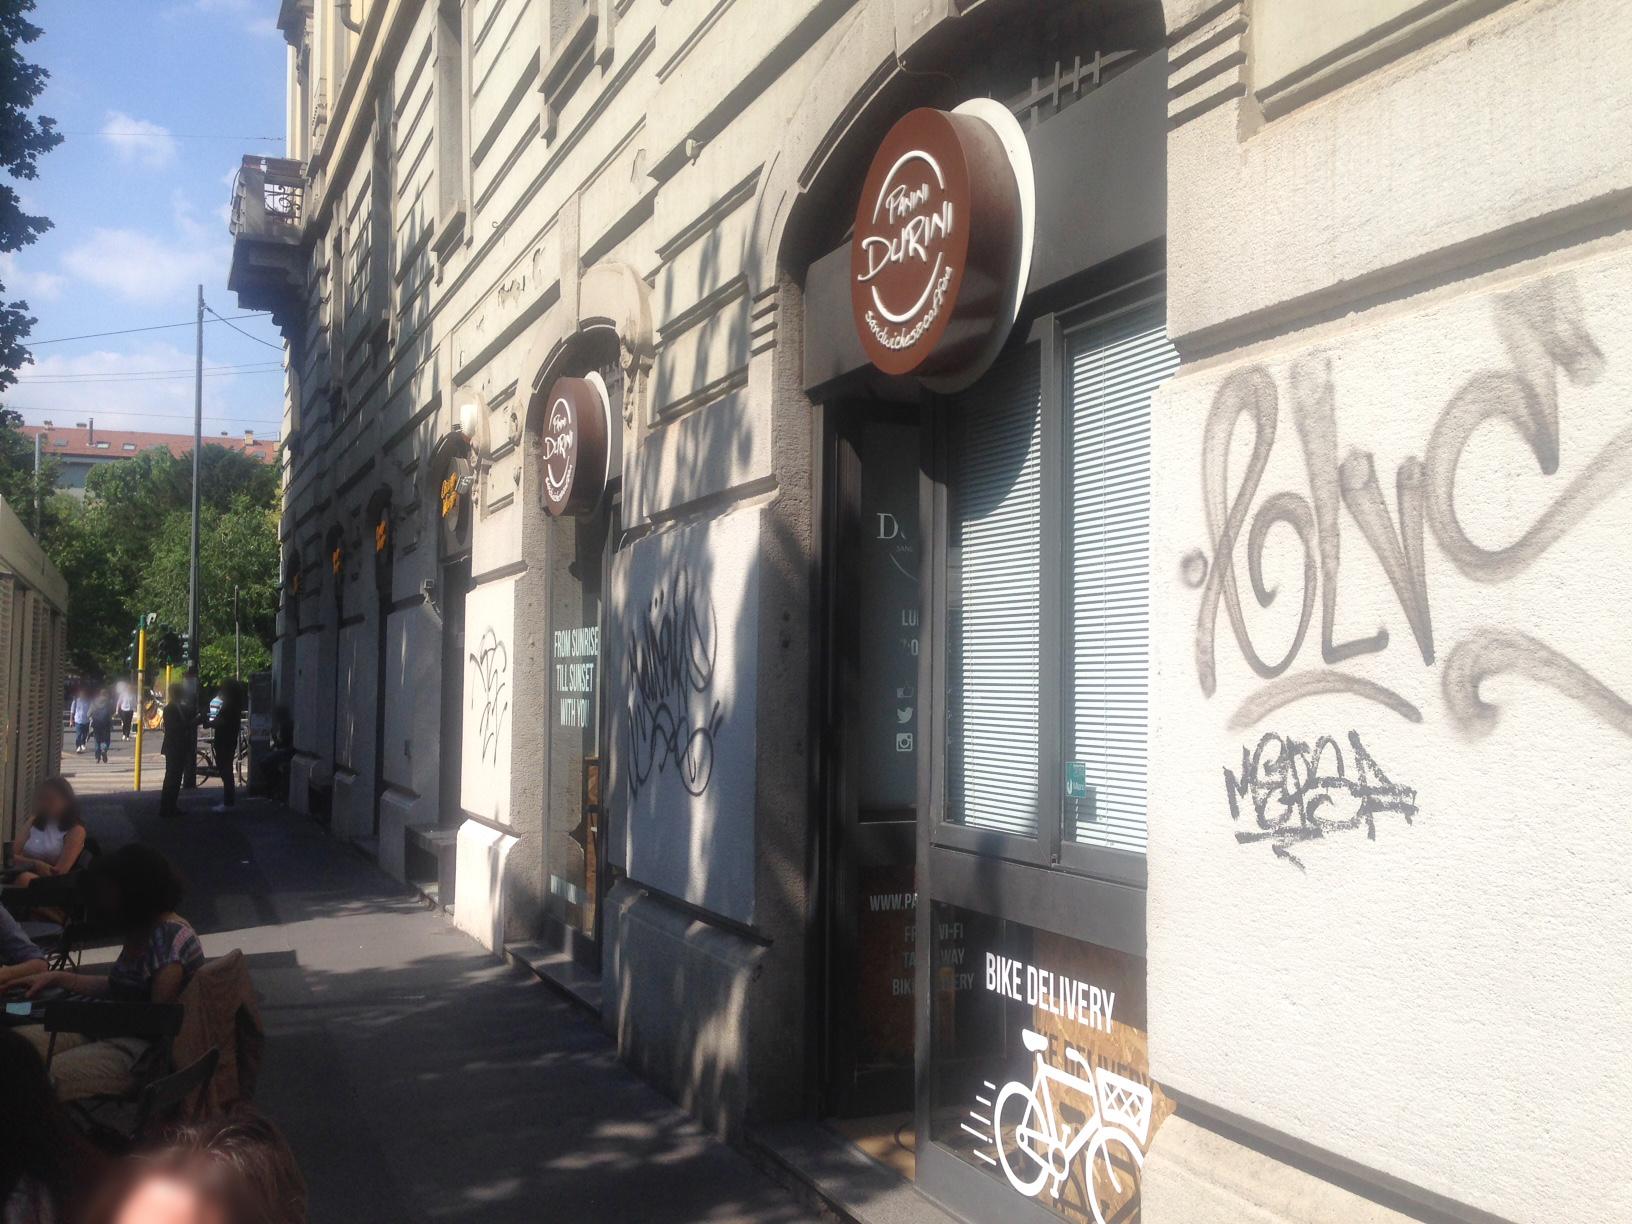 PANINI DURINI Via Ferdinando Bocconi 5